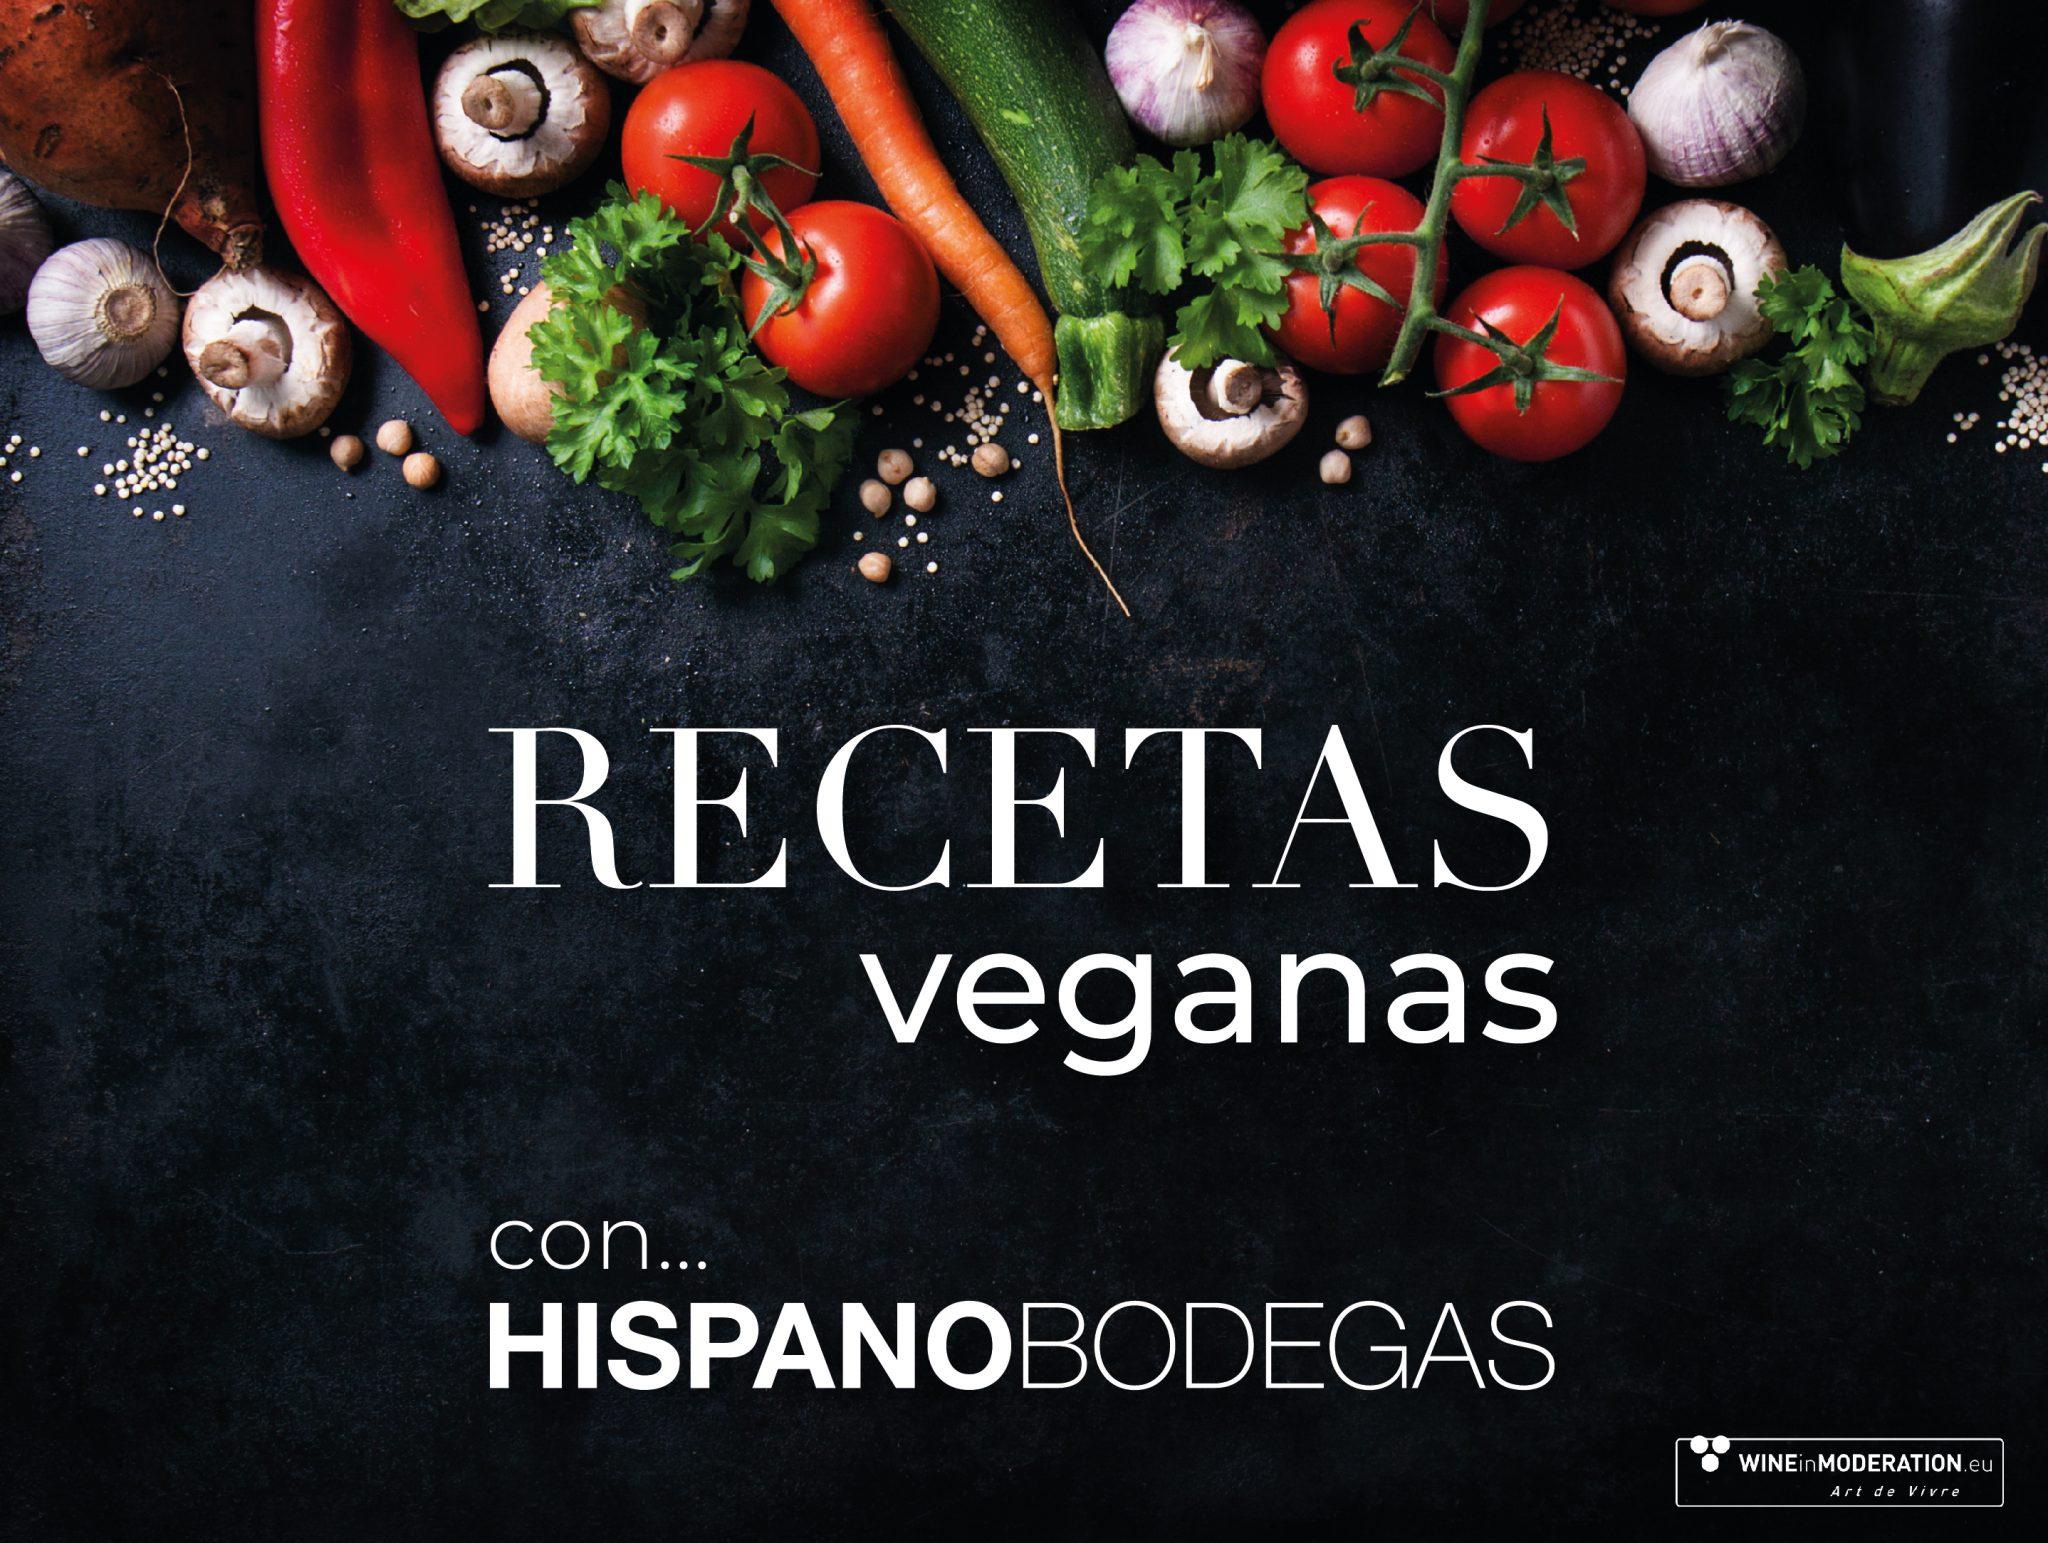 Recetas veganas con vinos veganos